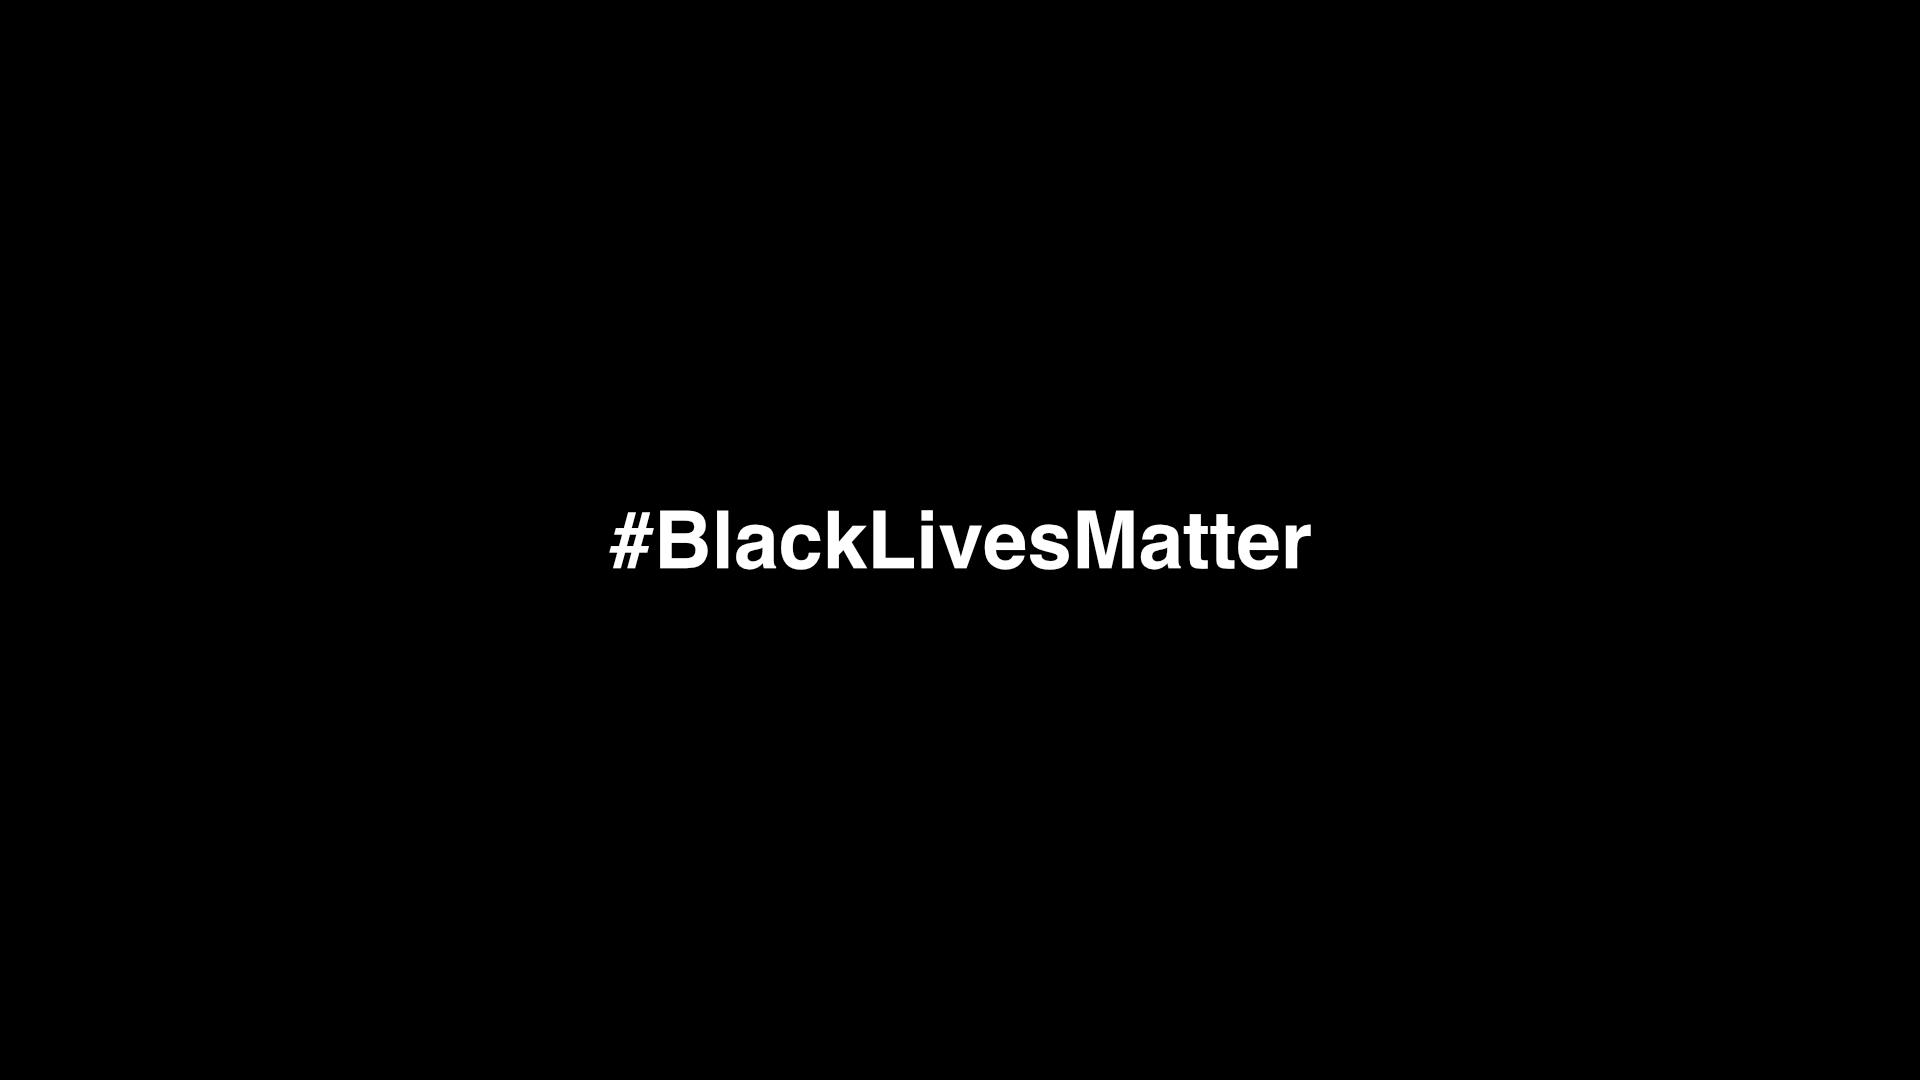 black lives matter desktop wallpaper 71339